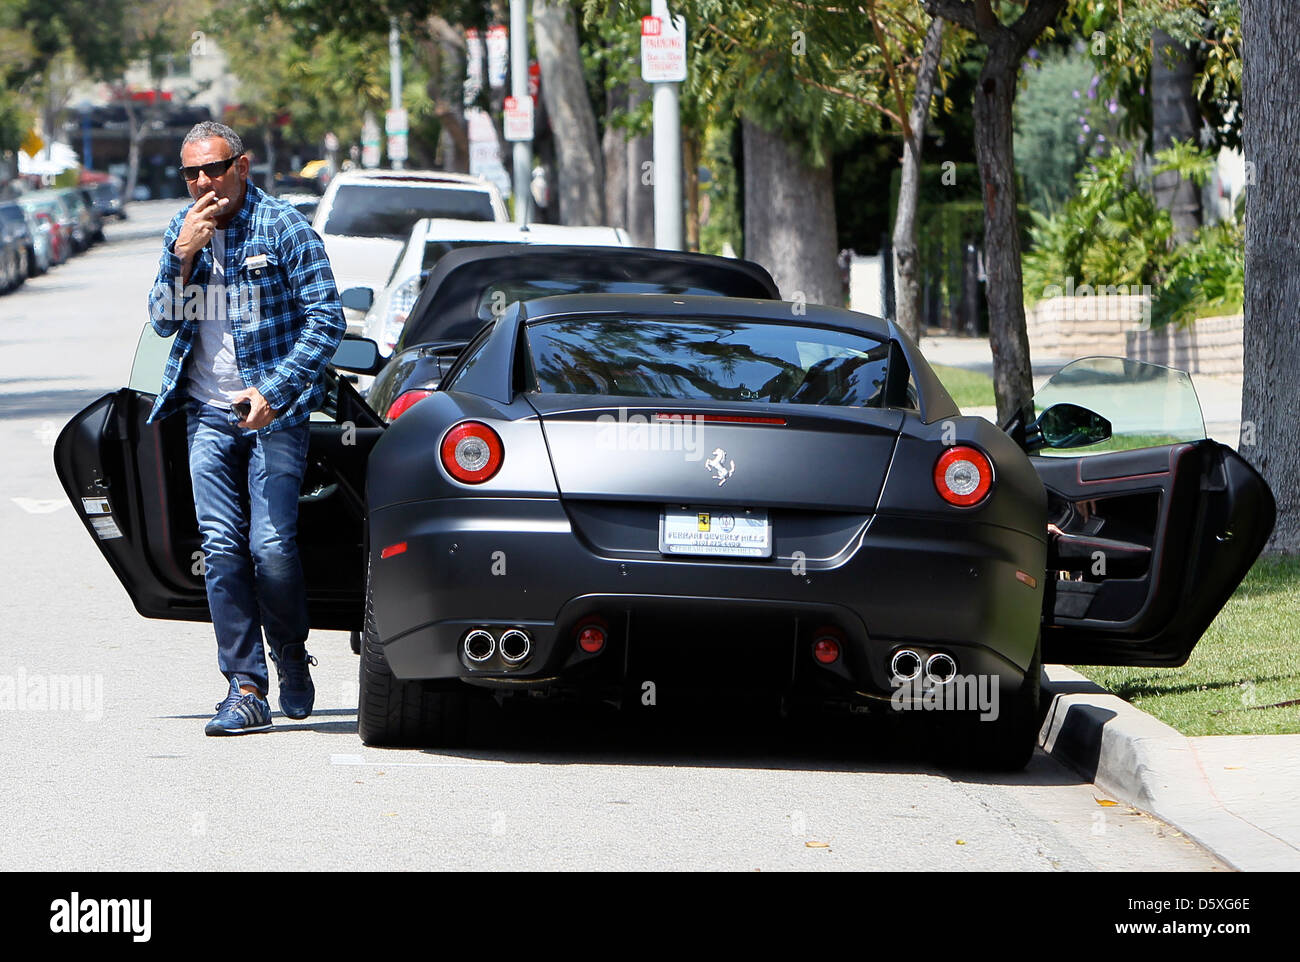 christian audigier and his girlfriend drive his matte black ferrari